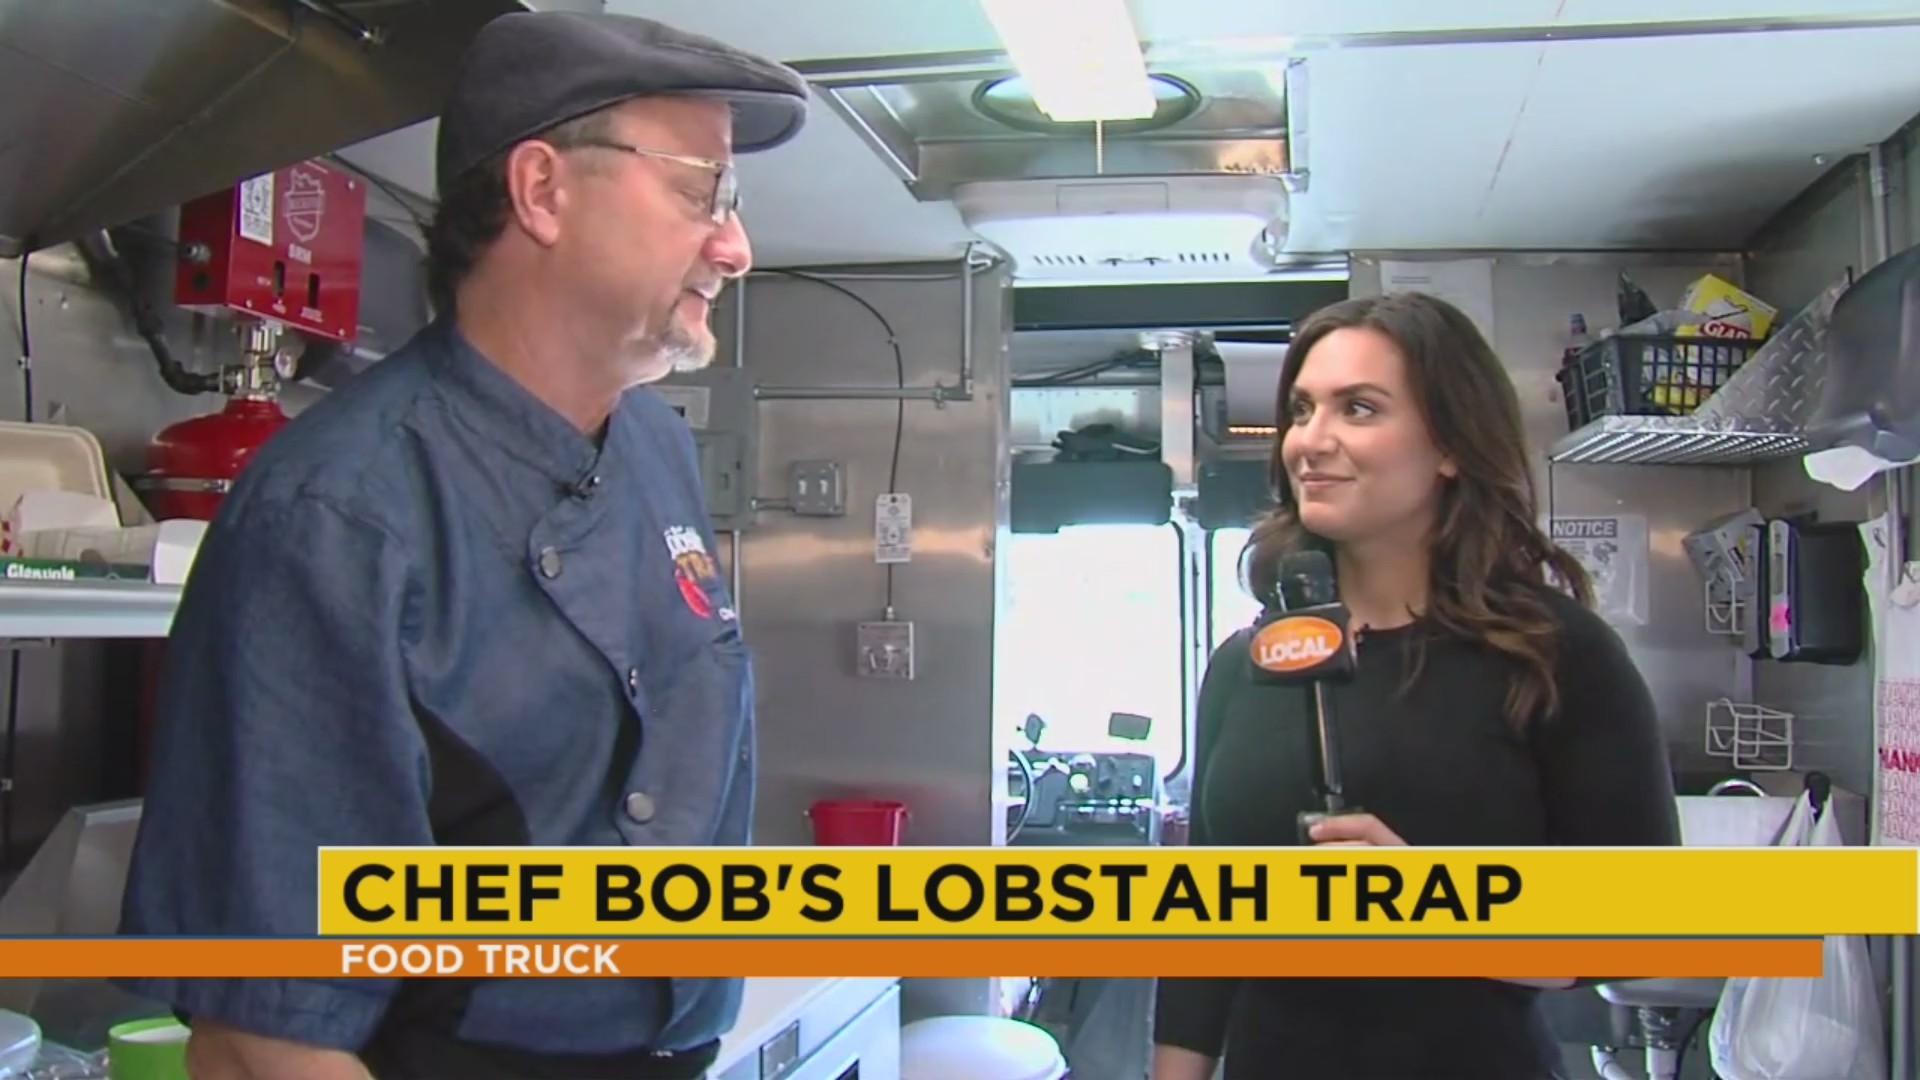 Chef Bob's Lobstah Trap